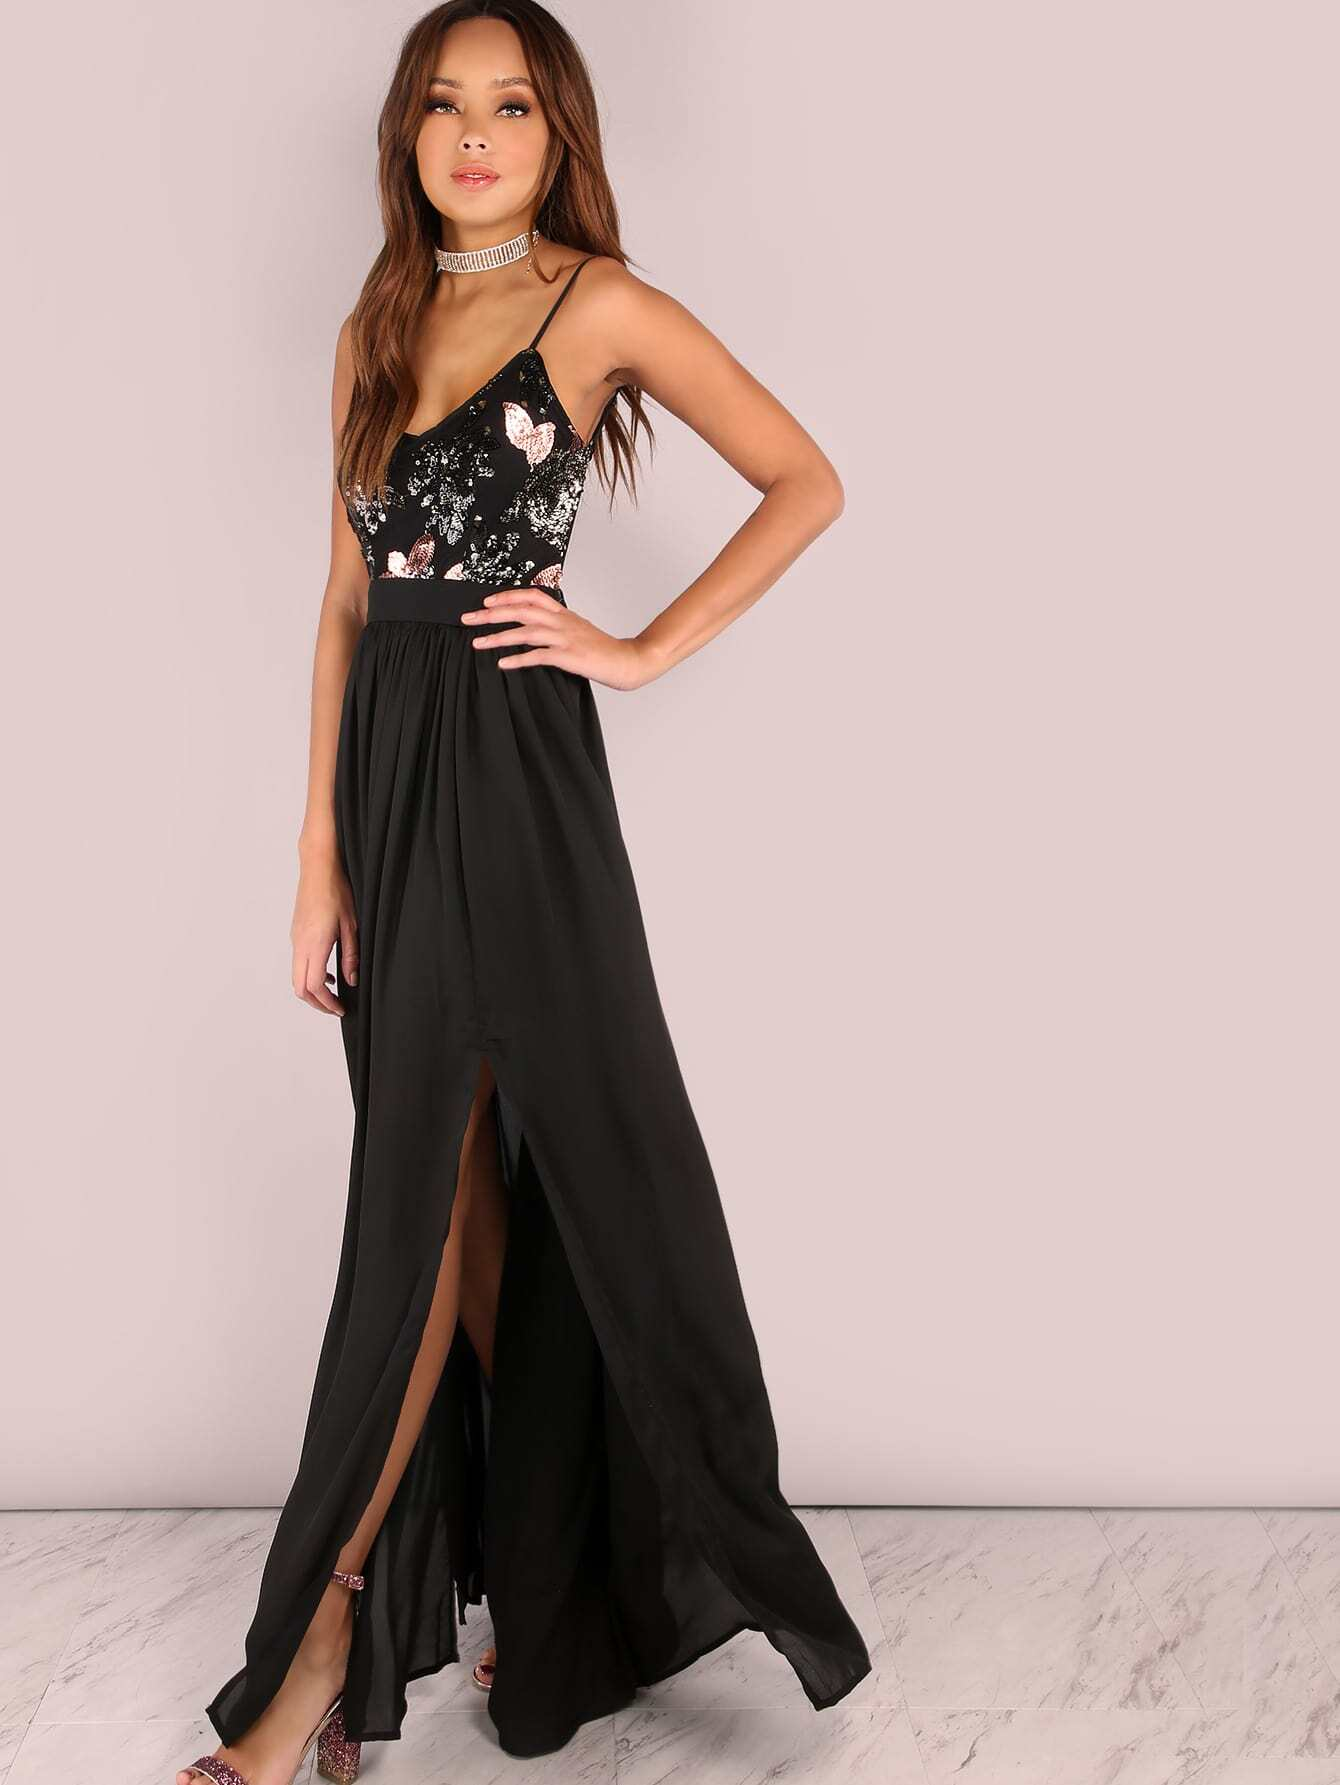 Backless maxi dress slit